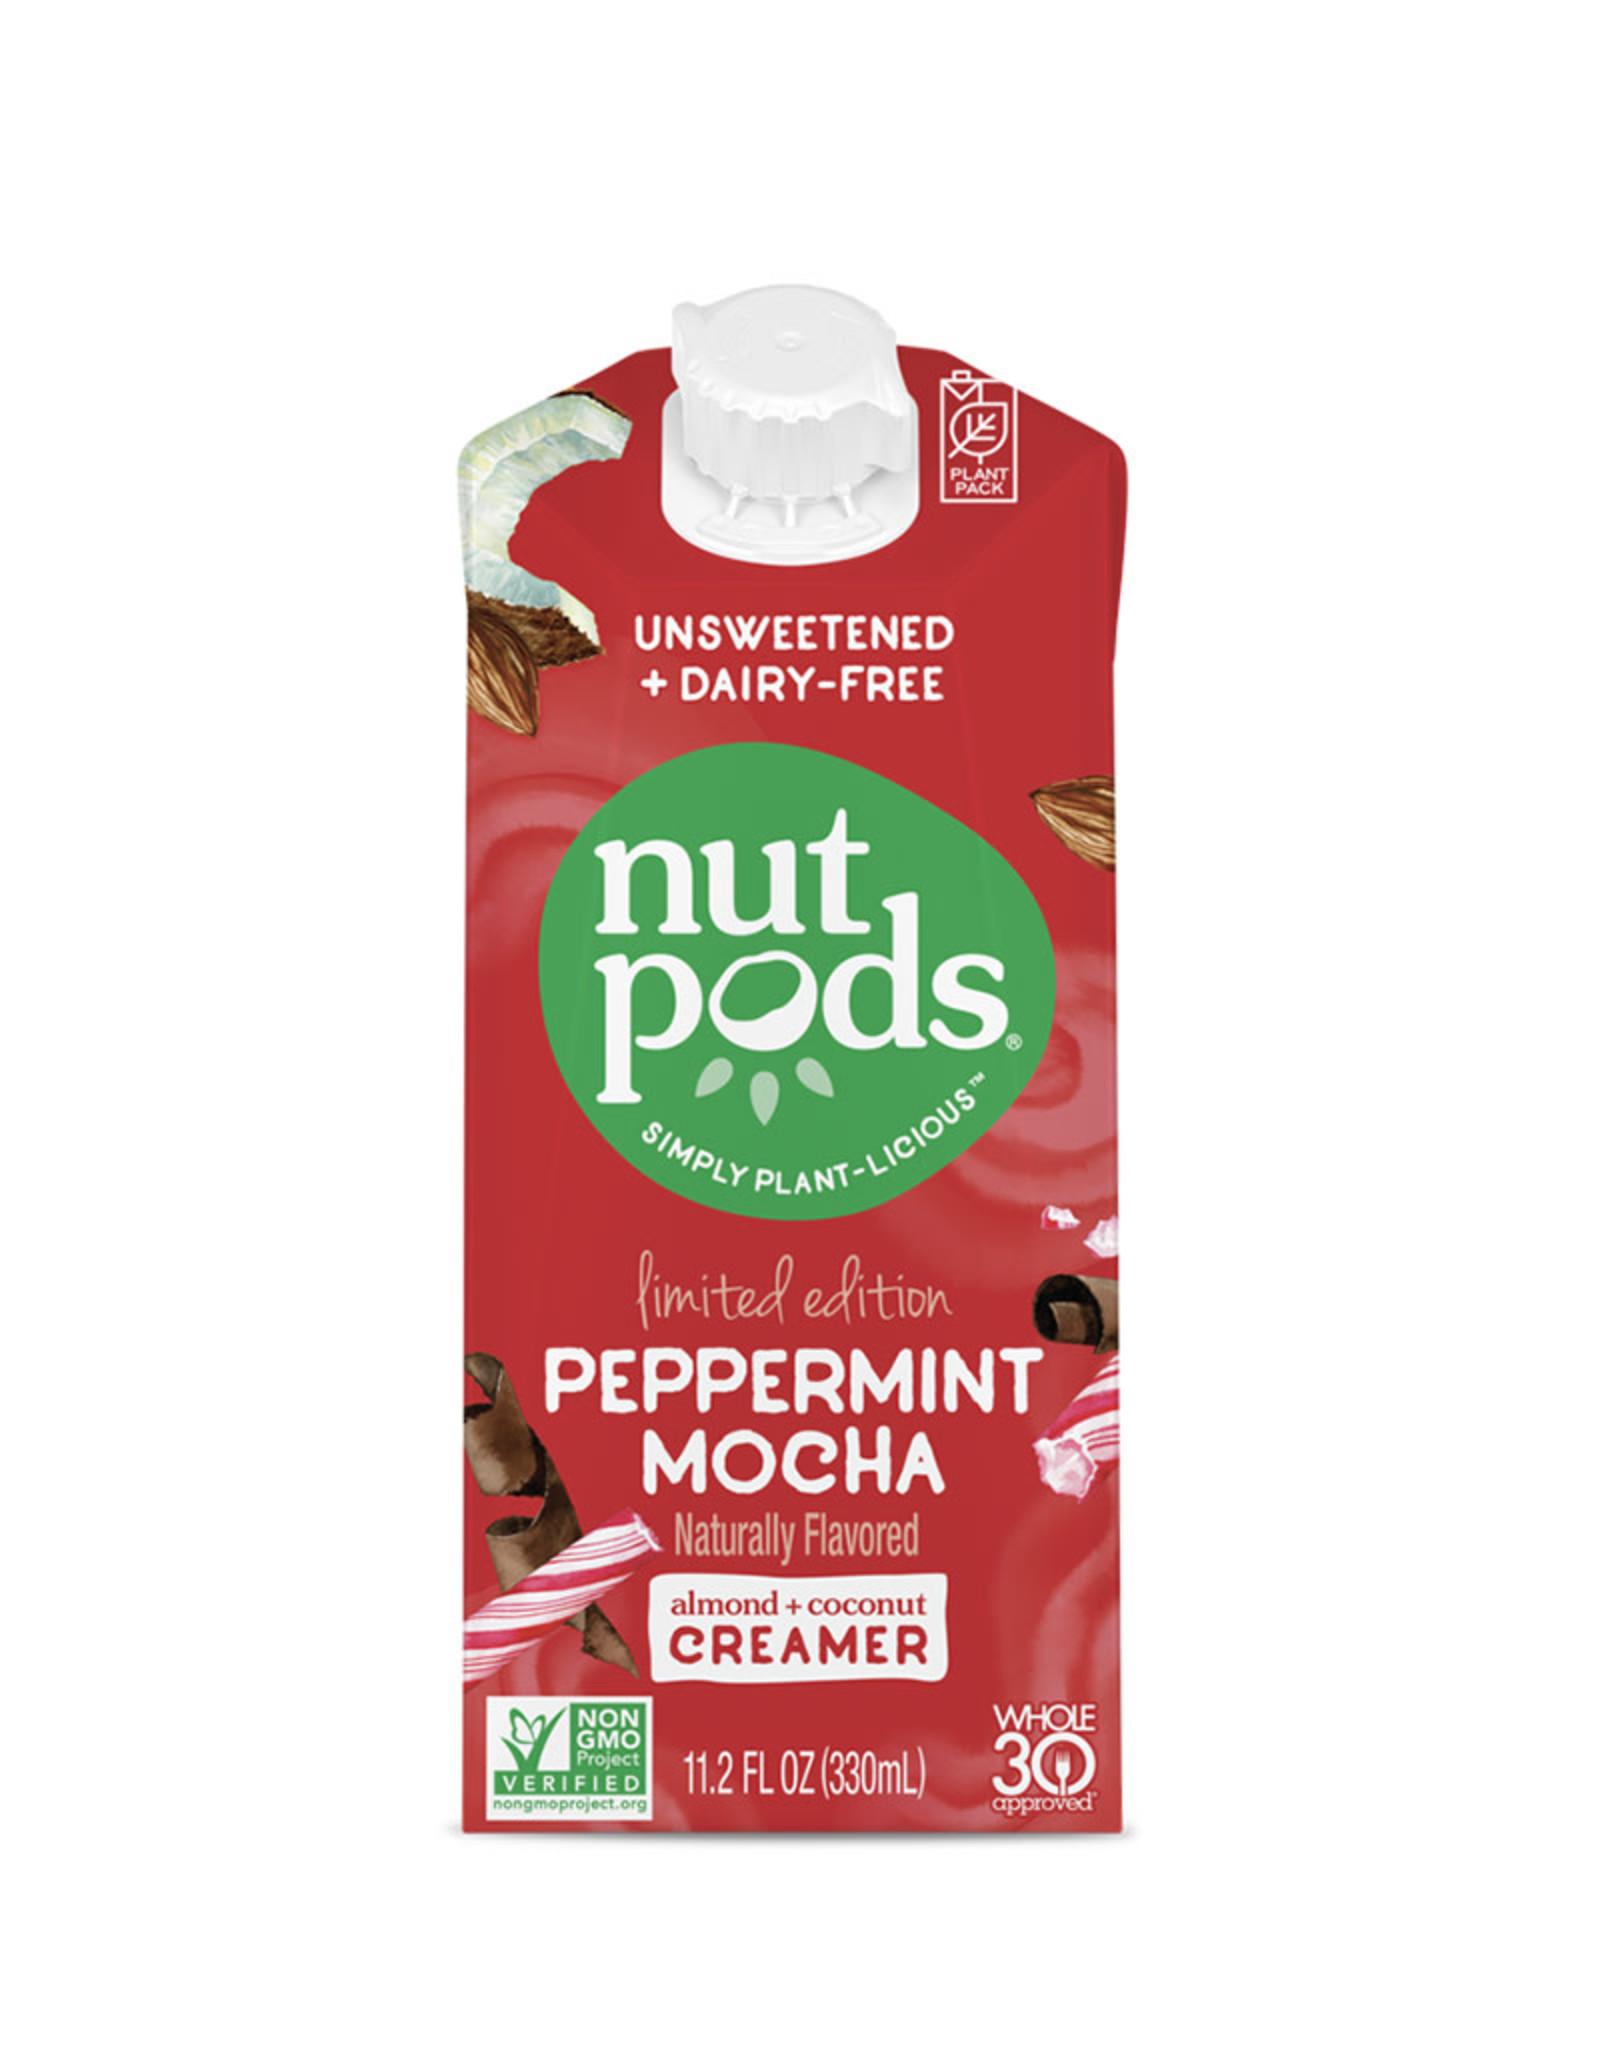 Nutpods Nutpods - Unsweetened Dairy-Free Creamer, Pumpkin Spice (330ml)